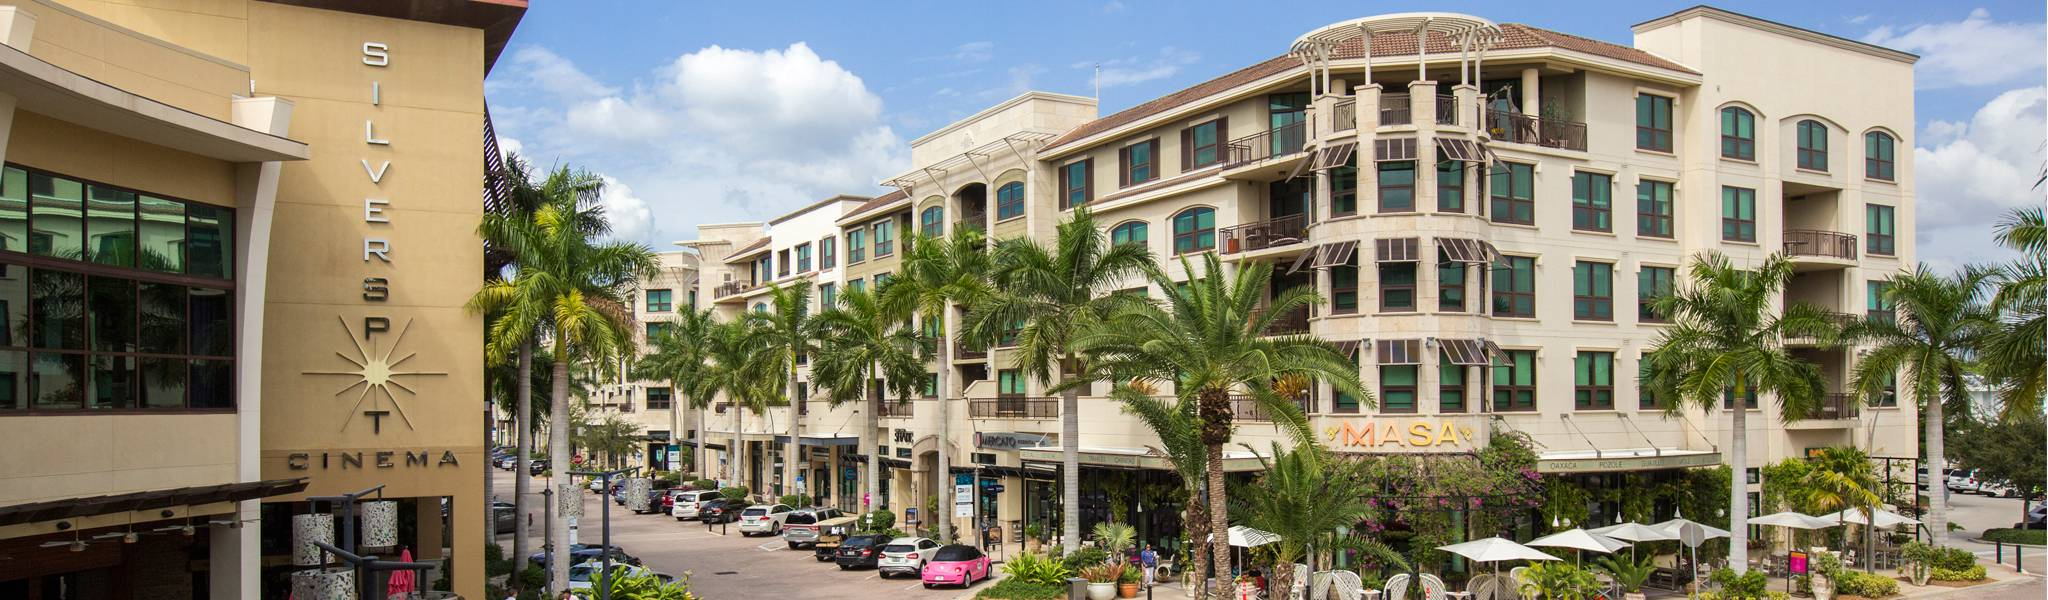 florida apartments for rent aspen square management